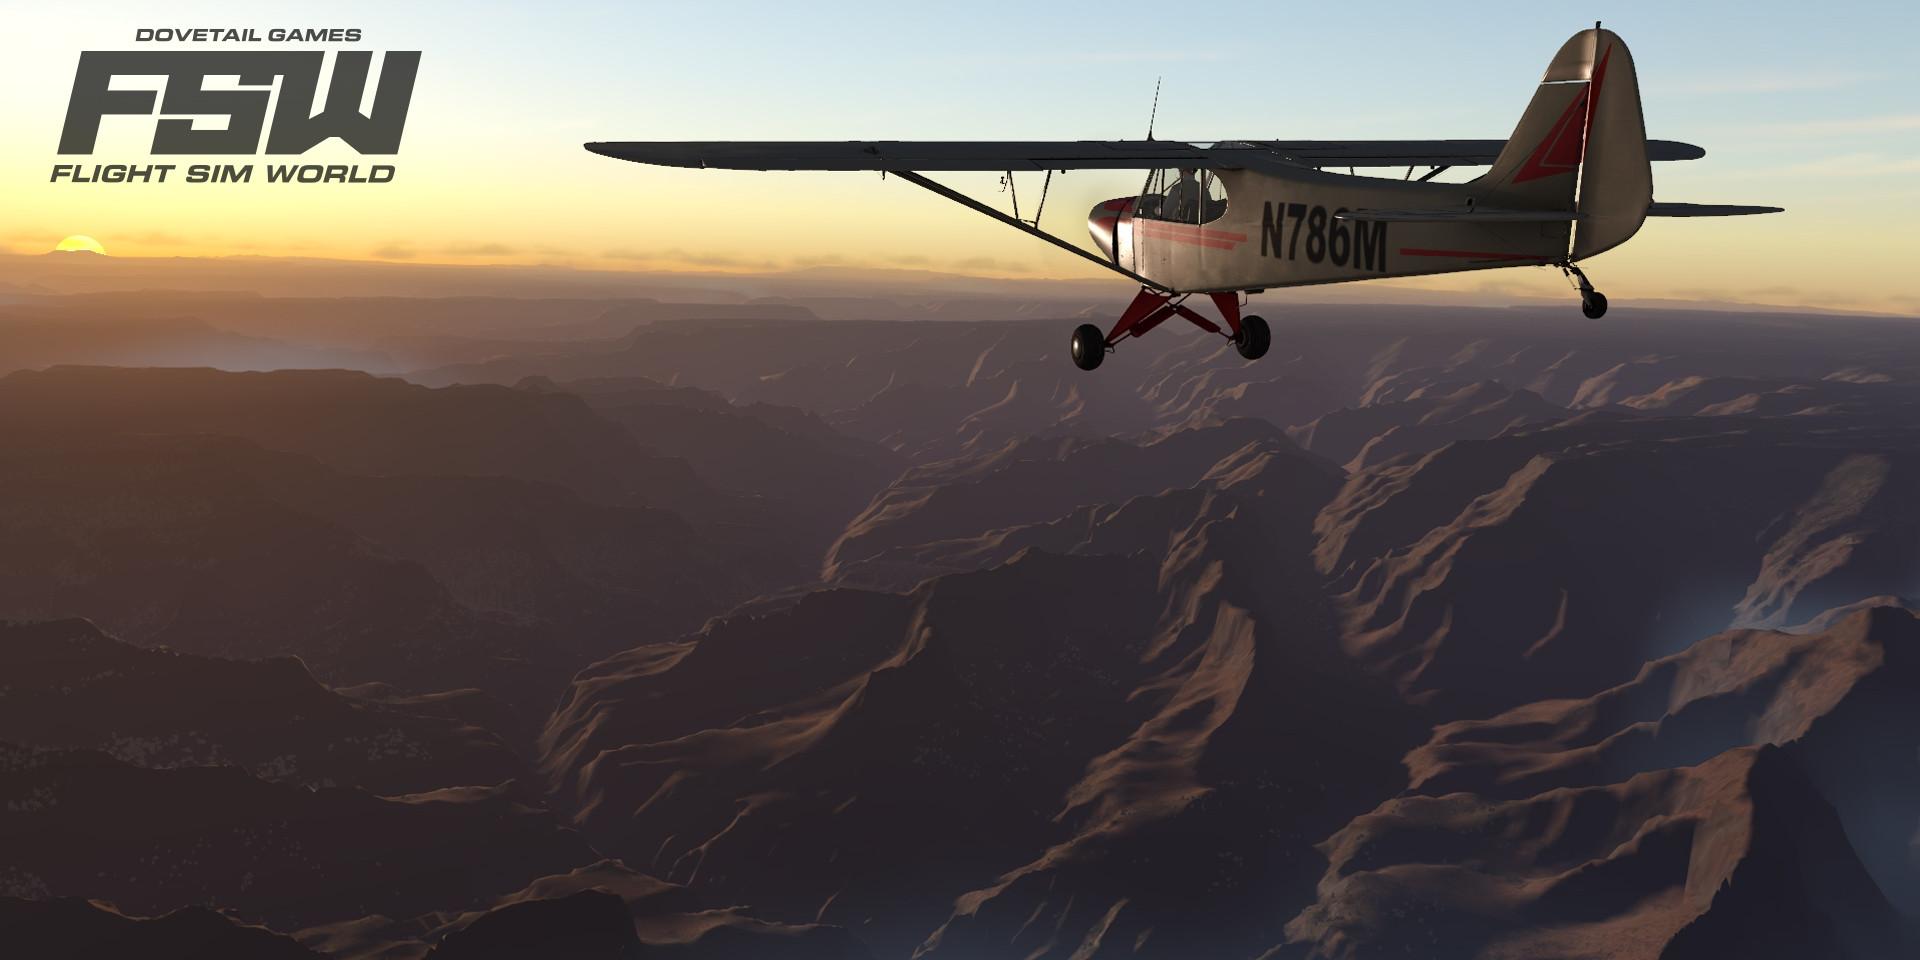 Dovetail Games ceasing Flight Sim World